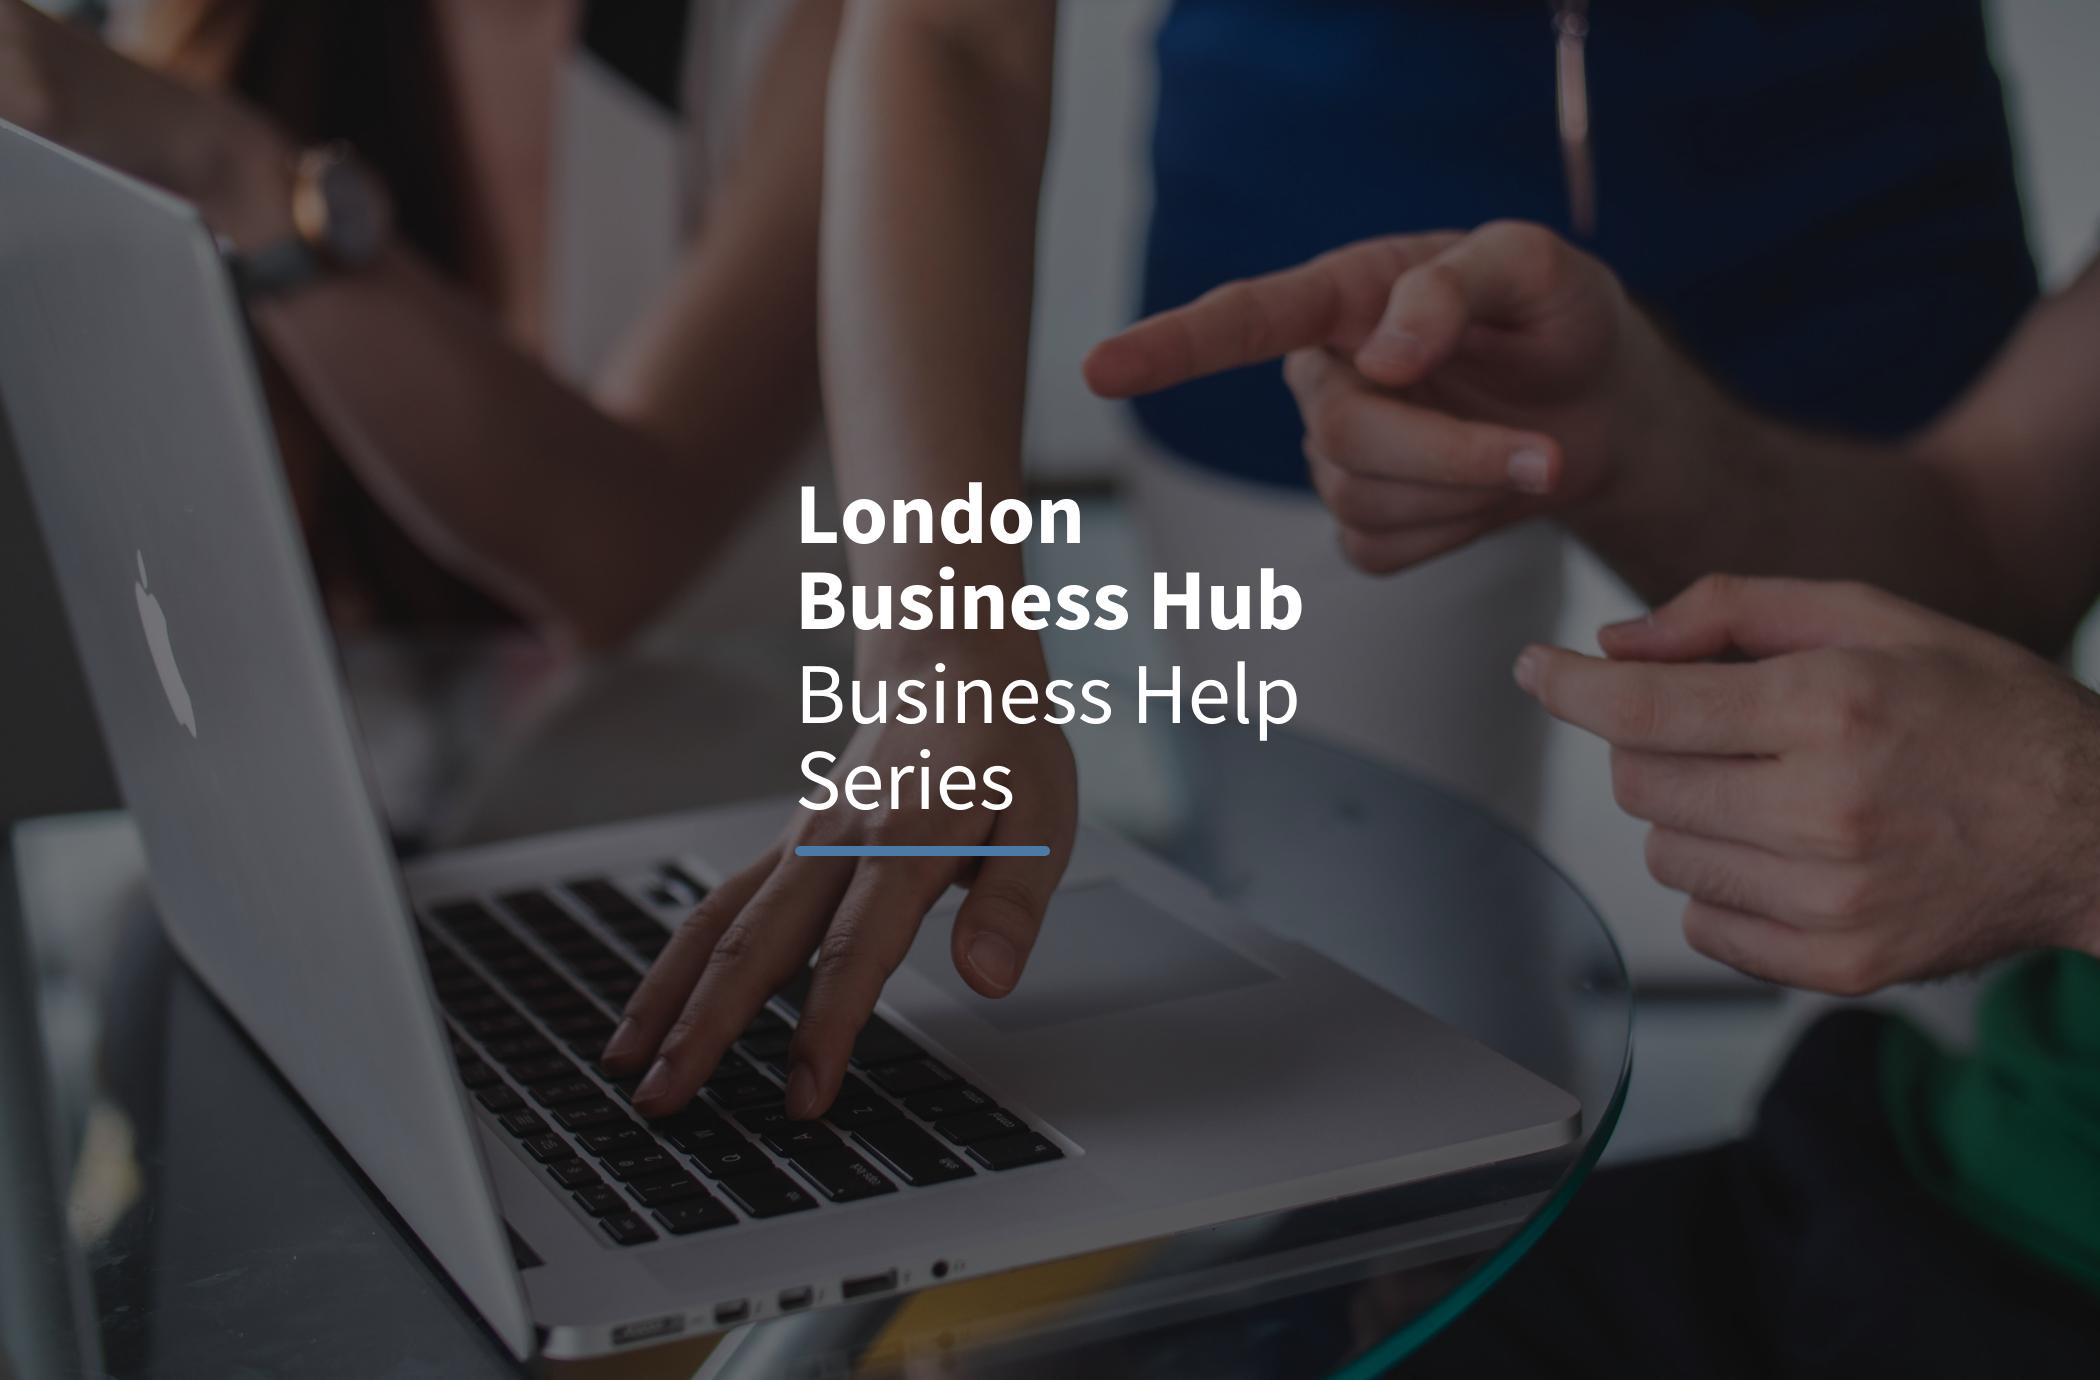 Business Help Series